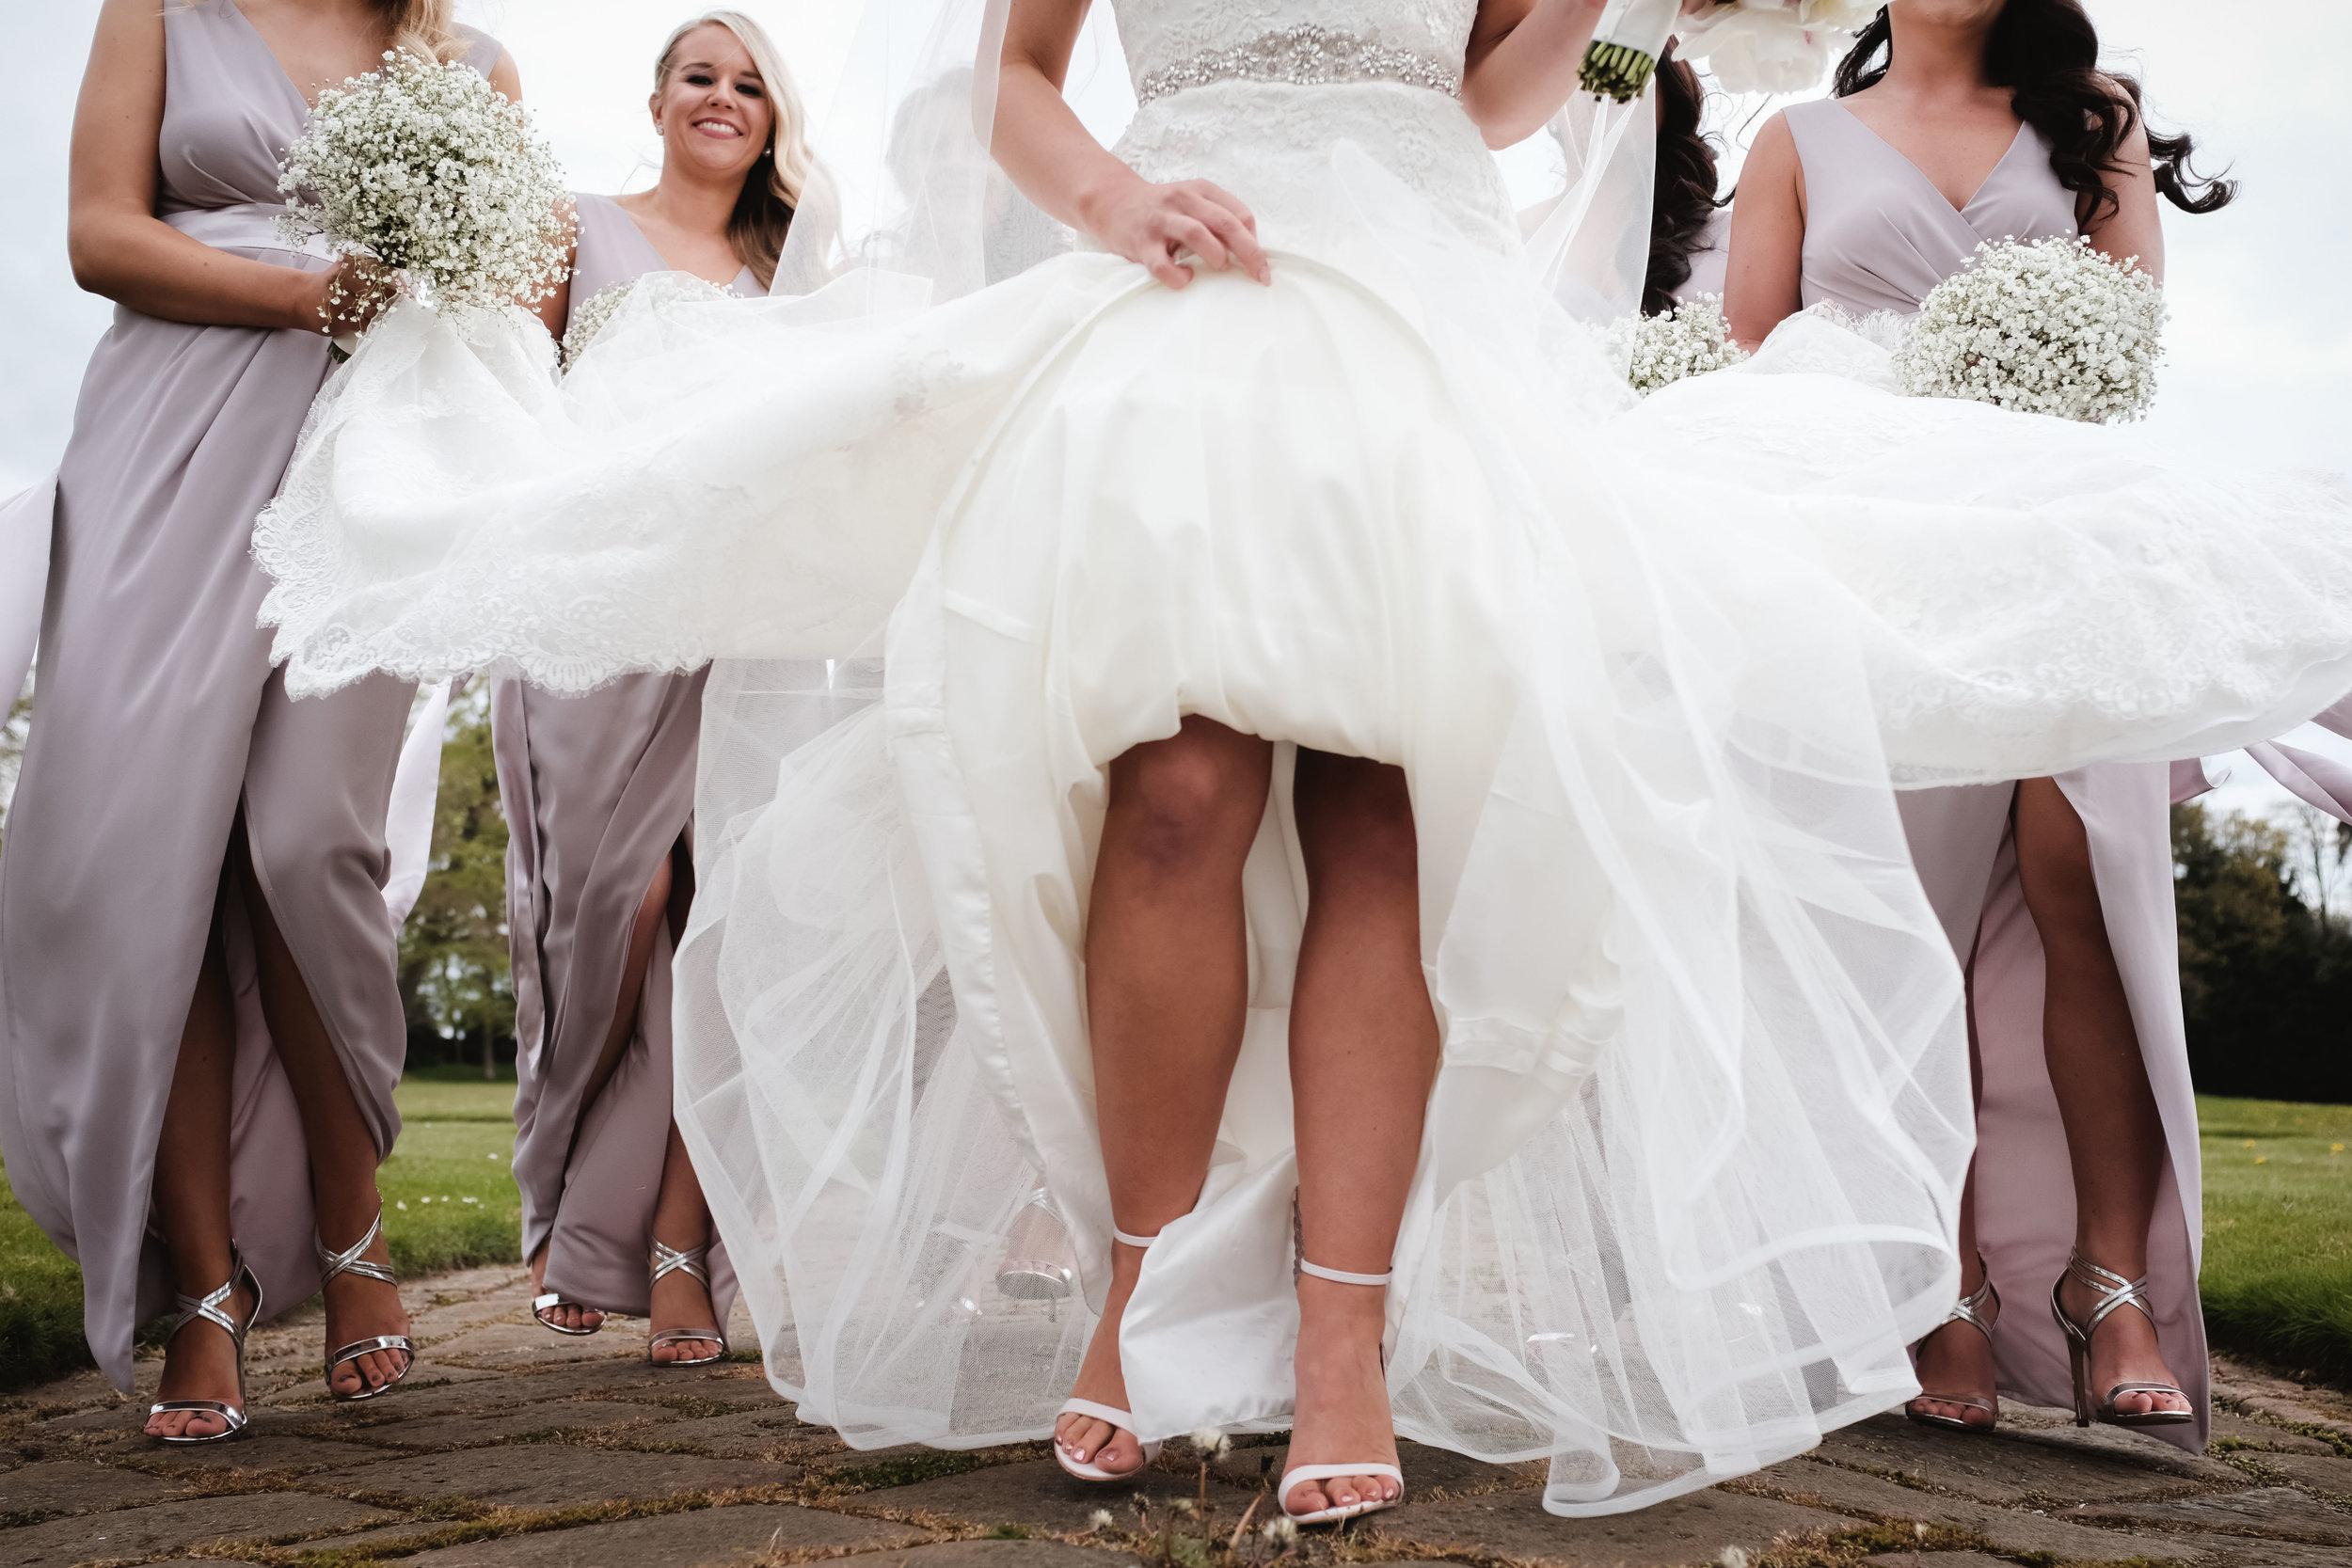 Thornton manor wedding photography cheshire wedding photographer liverpool manchester warrington chester wirral wedding BLOG (52 of 108).jpg